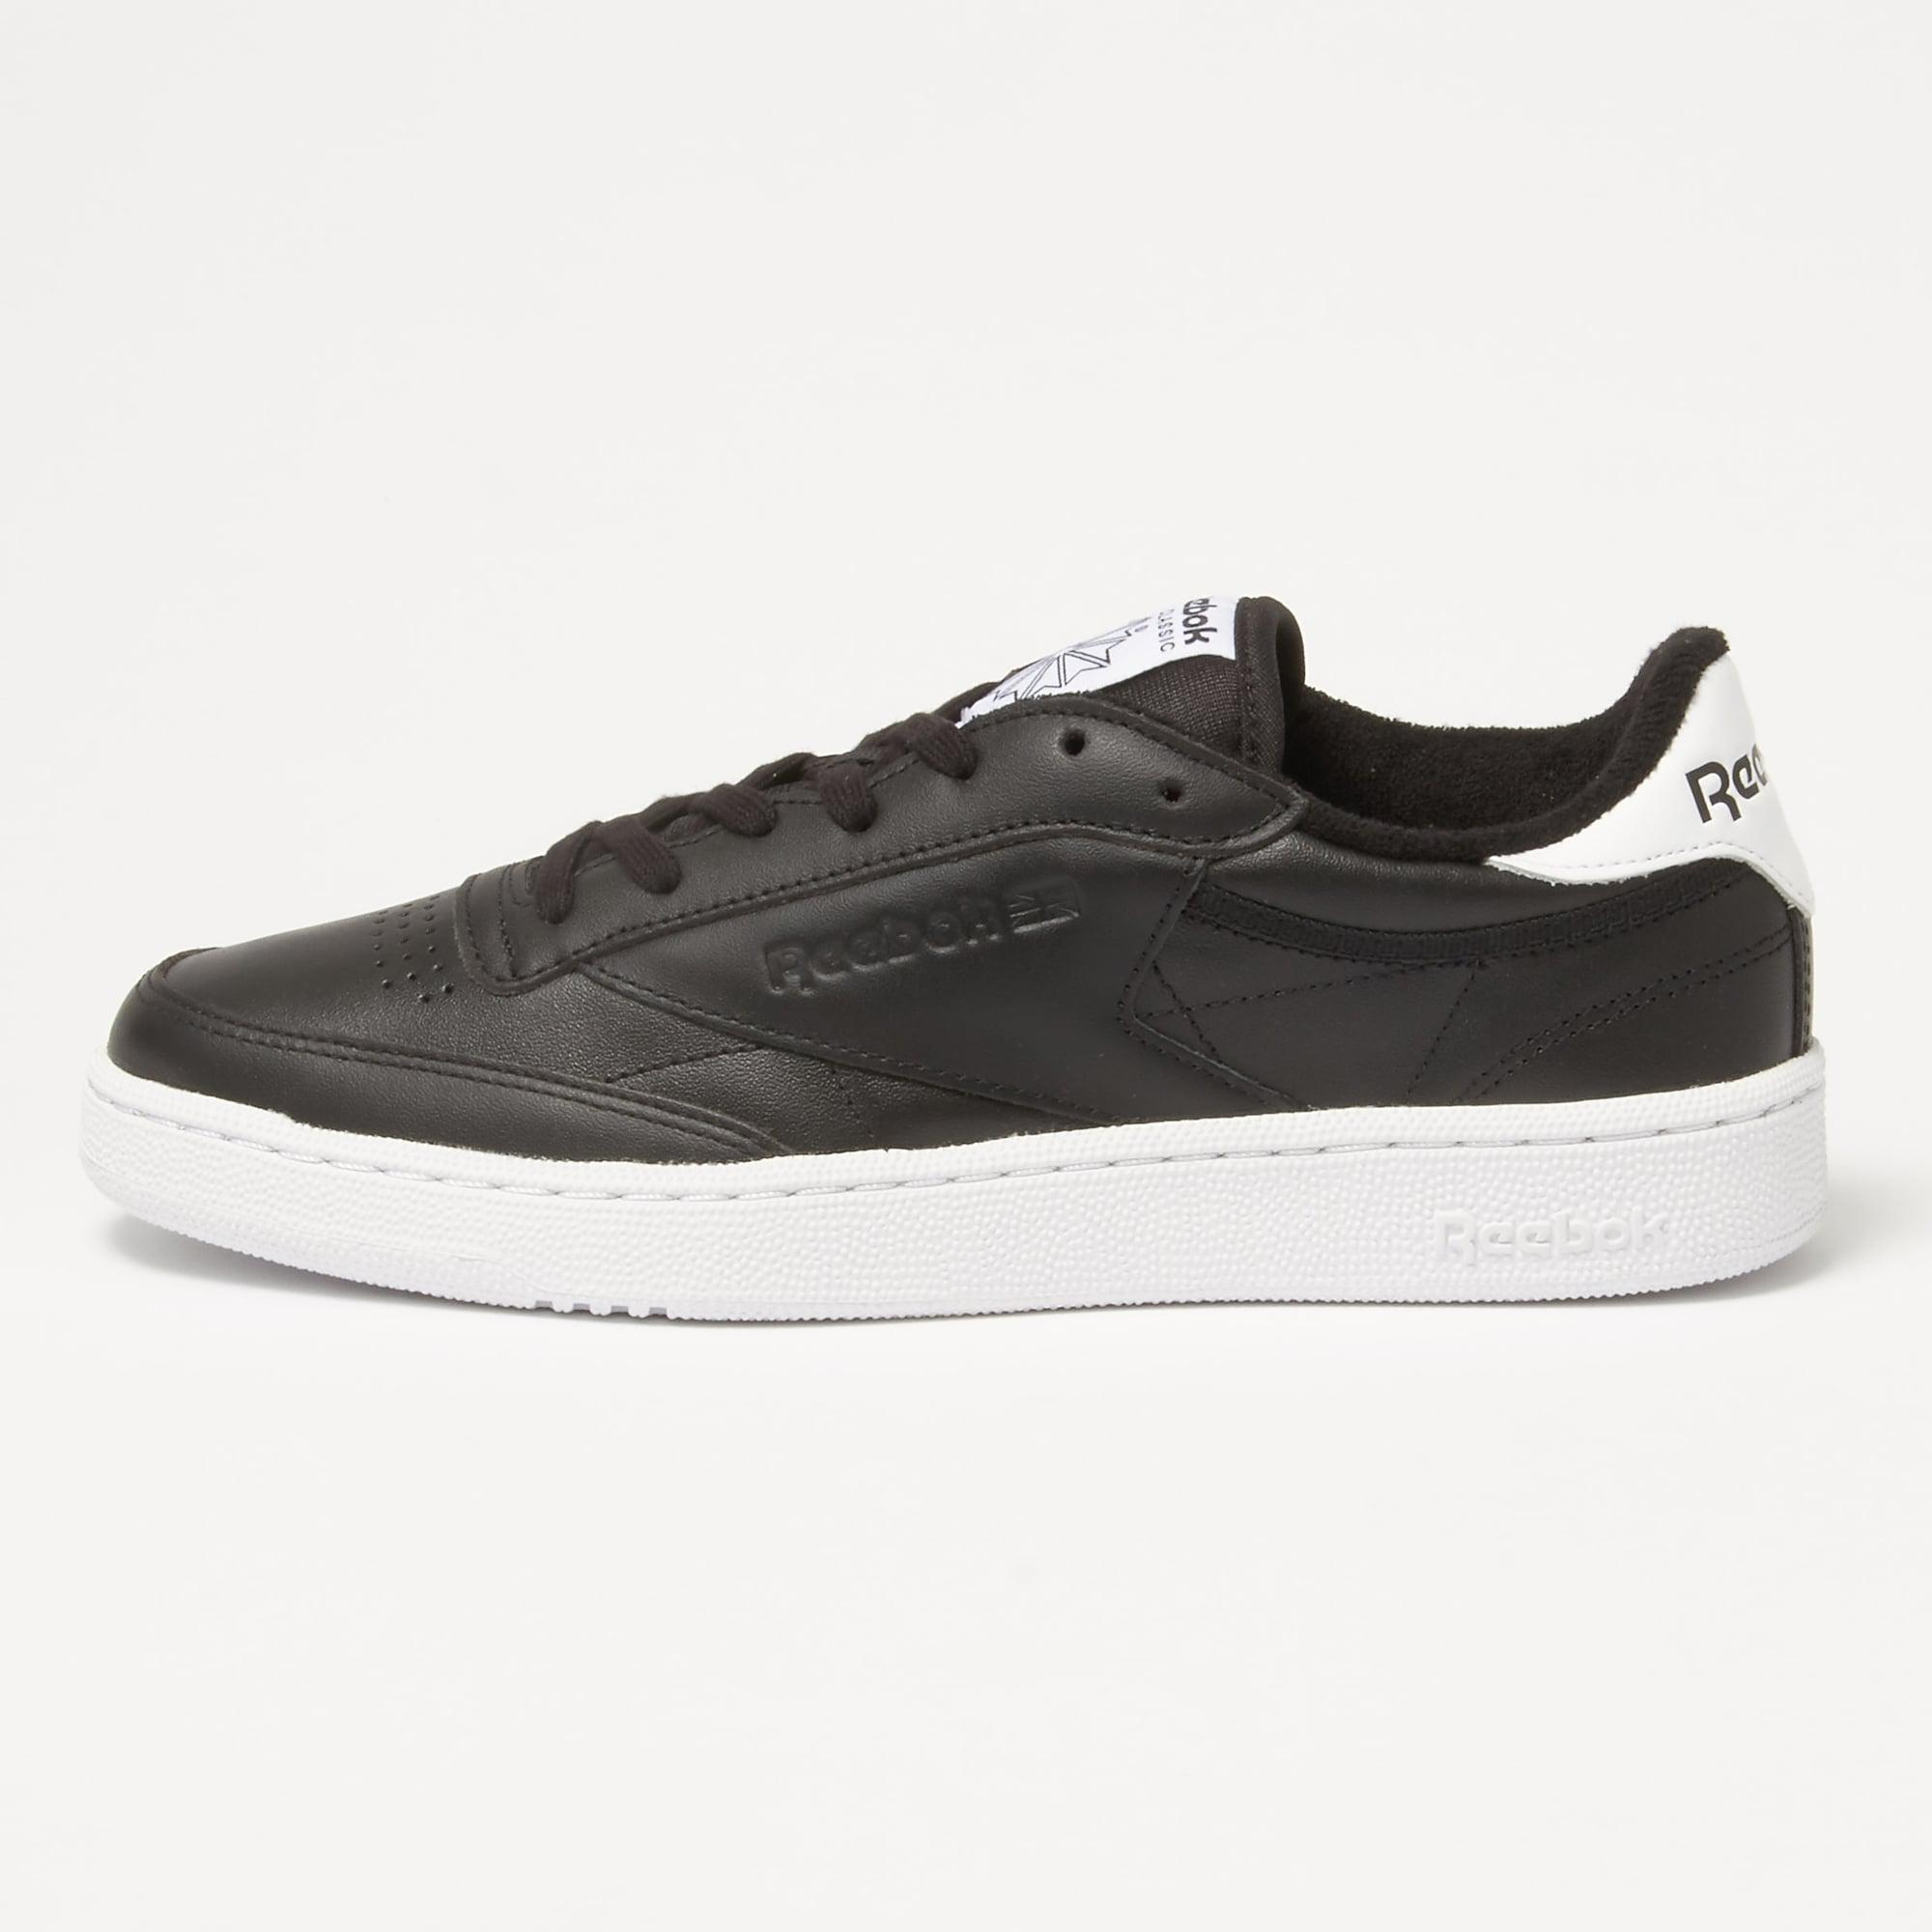 3302e962c68 Reebok - Club C85 El Black Sneakers Bd5685 for Men - Lyst. View fullscreen